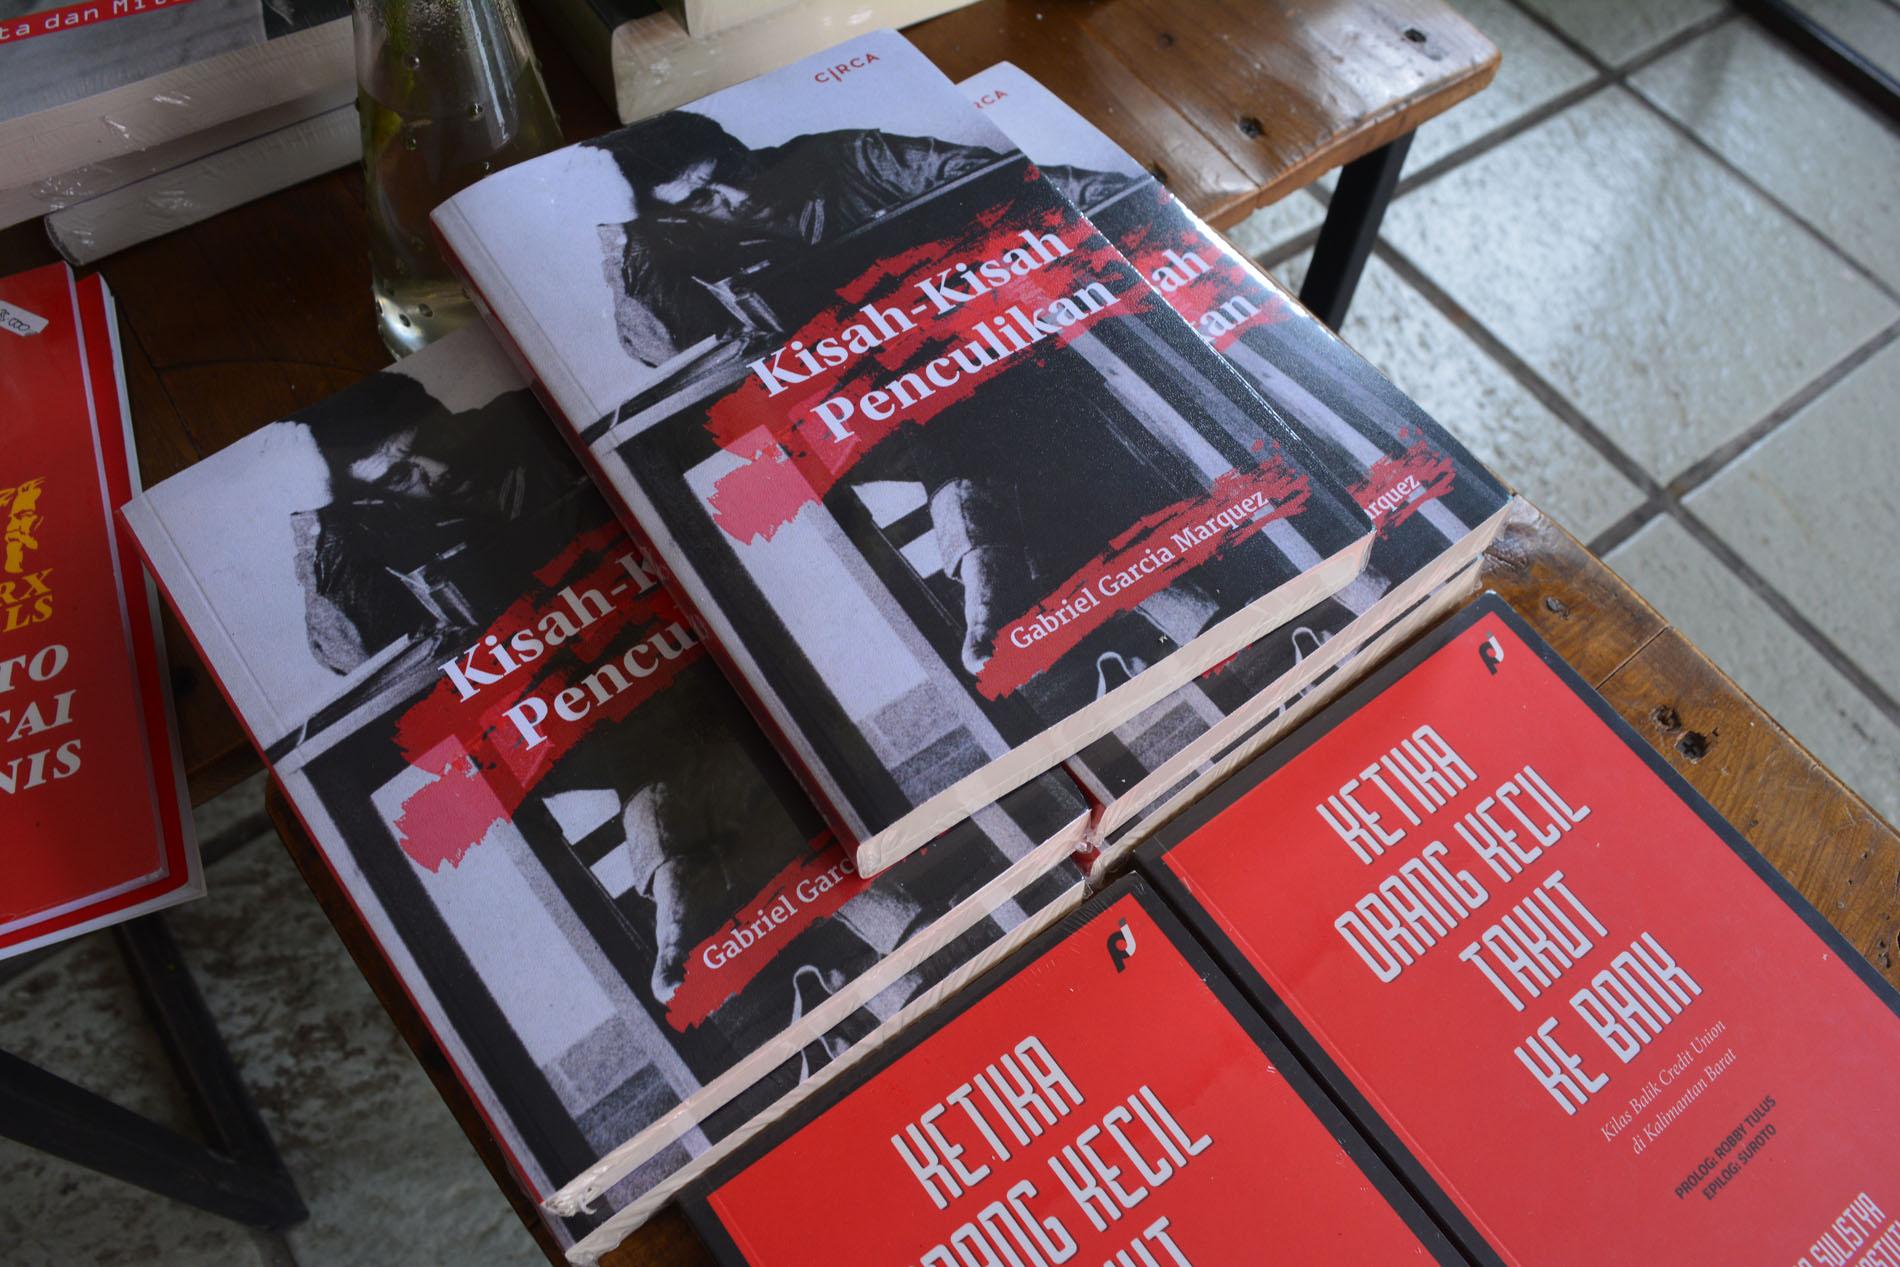 Di Indonesia, Gabo lebih dikenal sebagai sastrawan ketimbang jurnalis, terutama berkat novel Seratus Tahun Kesunyian. Kisah Kisah Penculikan (News of Kidnapping) adalah naskah nonfiksi ketiga yang diterbitkan setelah Caldas oleh LKiS (2002) dan Klandestin di Chile oleh Akubaca (2002). Buku ini dibahas pada salah satu sesi diskusi di Pekan Buku Indie #1, Rabu (1/6)